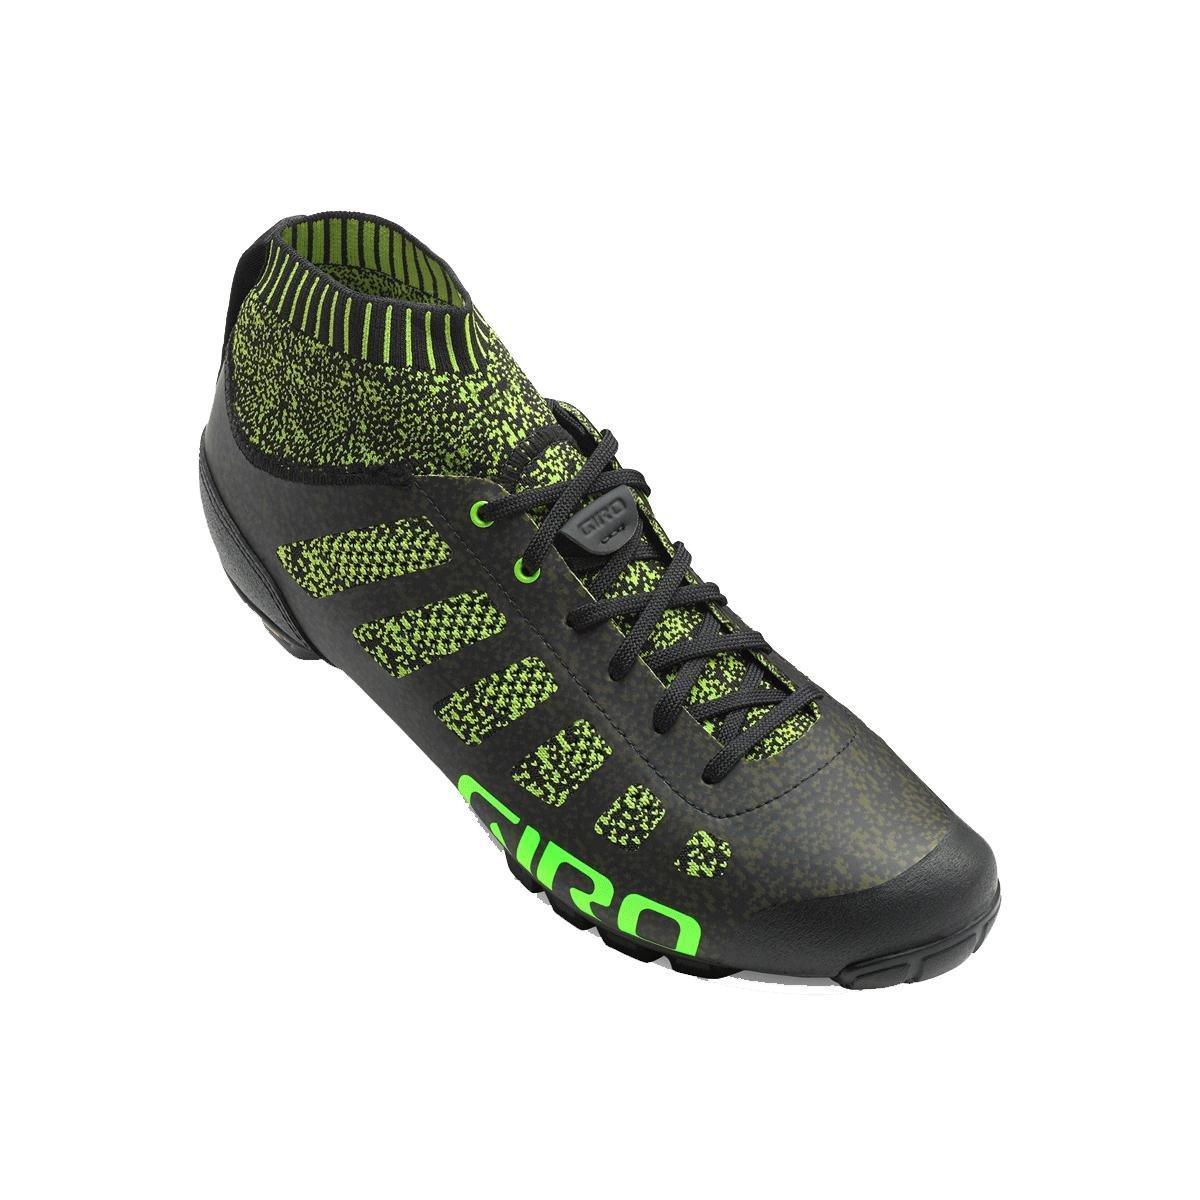 Giro Empire Vr70 Knit MTB, Zapatos de Bicicleta de Montaña para Hombre: Amazon.es: Zapatos y complementos